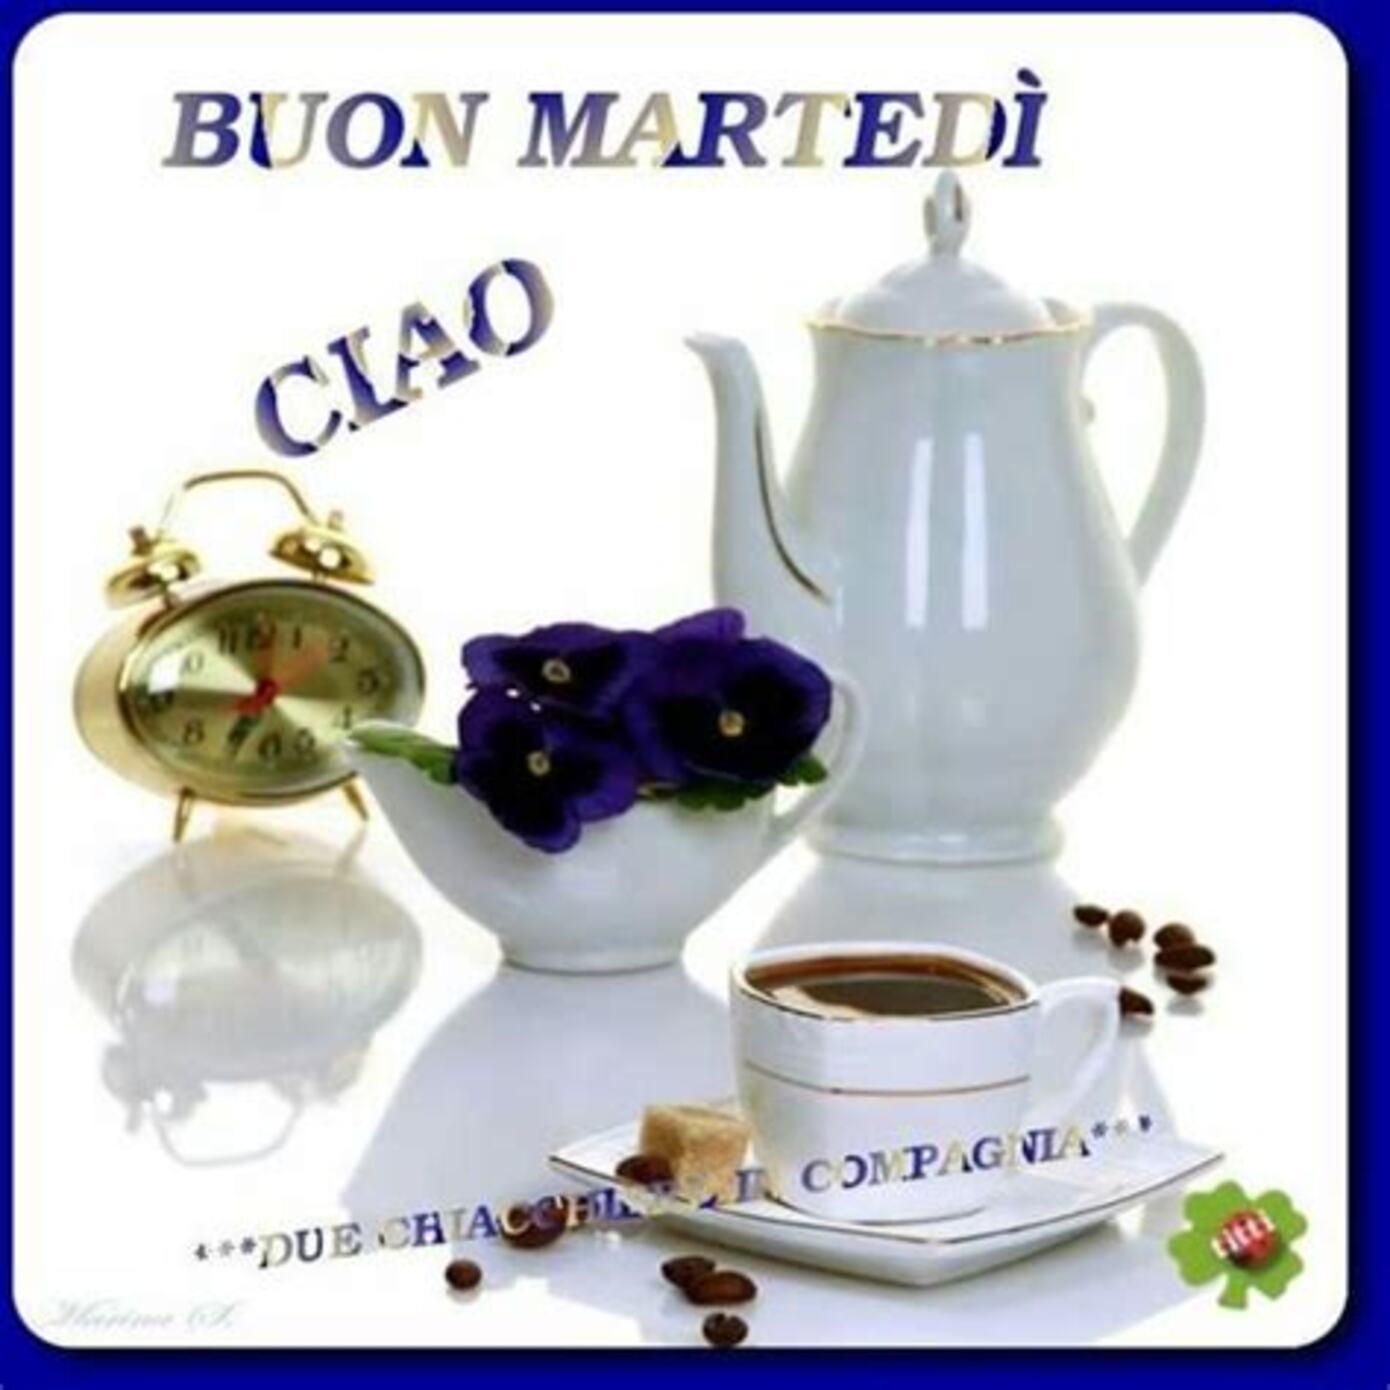 Buon Martedì Ciao